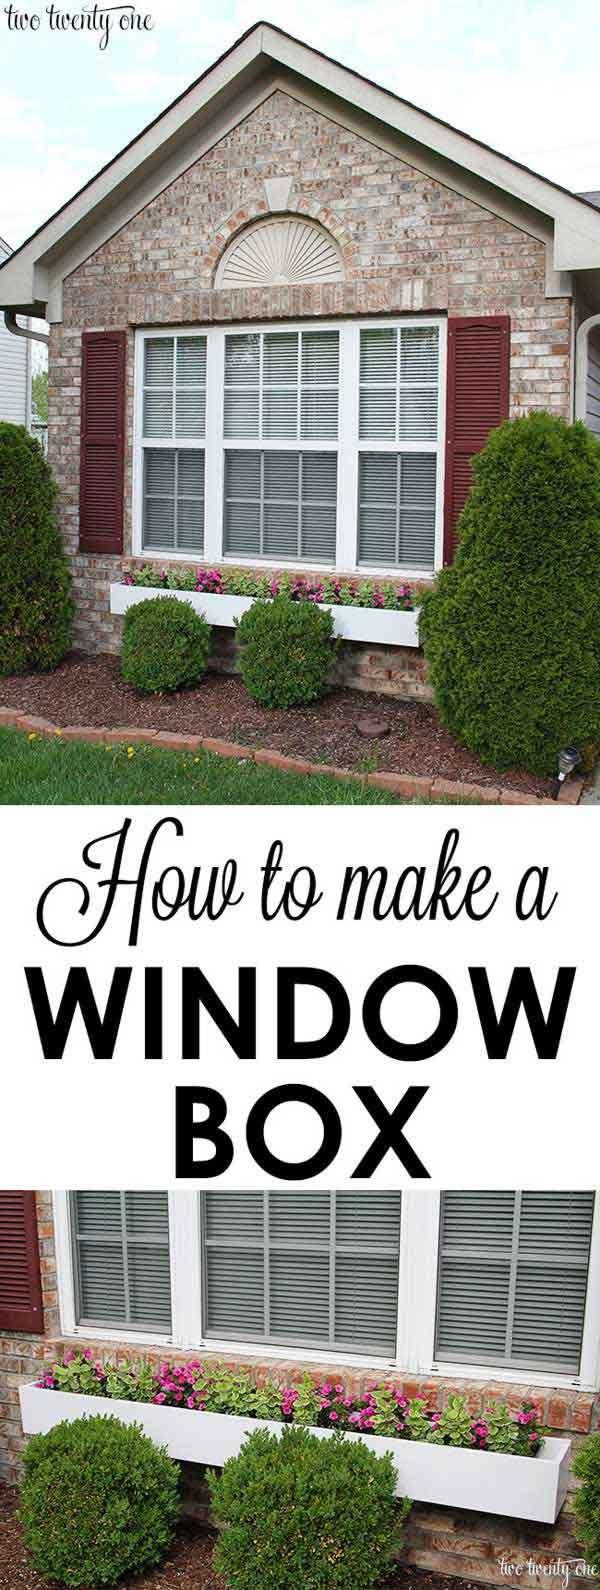 add a window box.